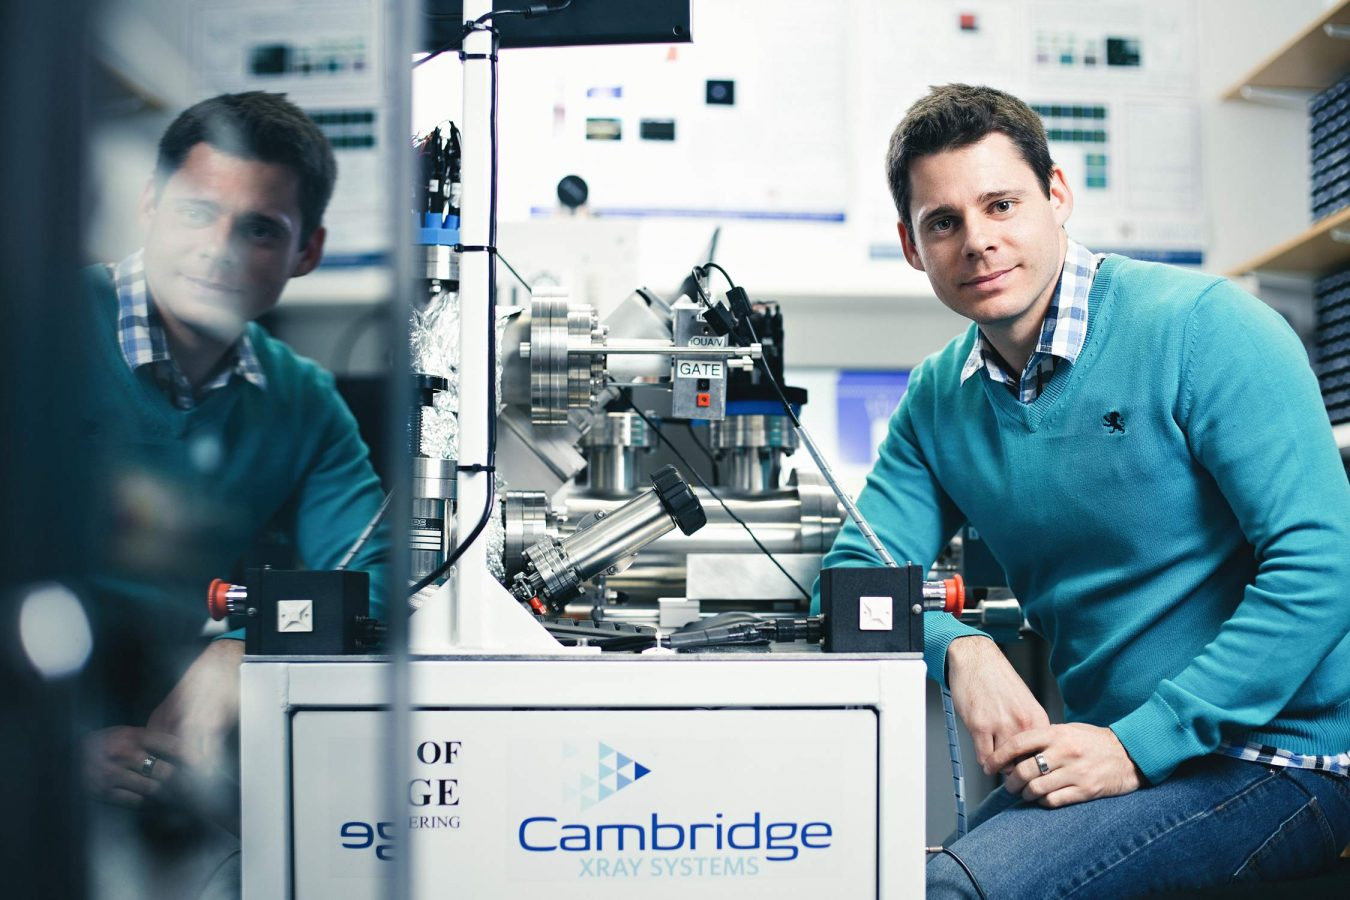 university-of-cambridge-lab-photography-reflection-portrait